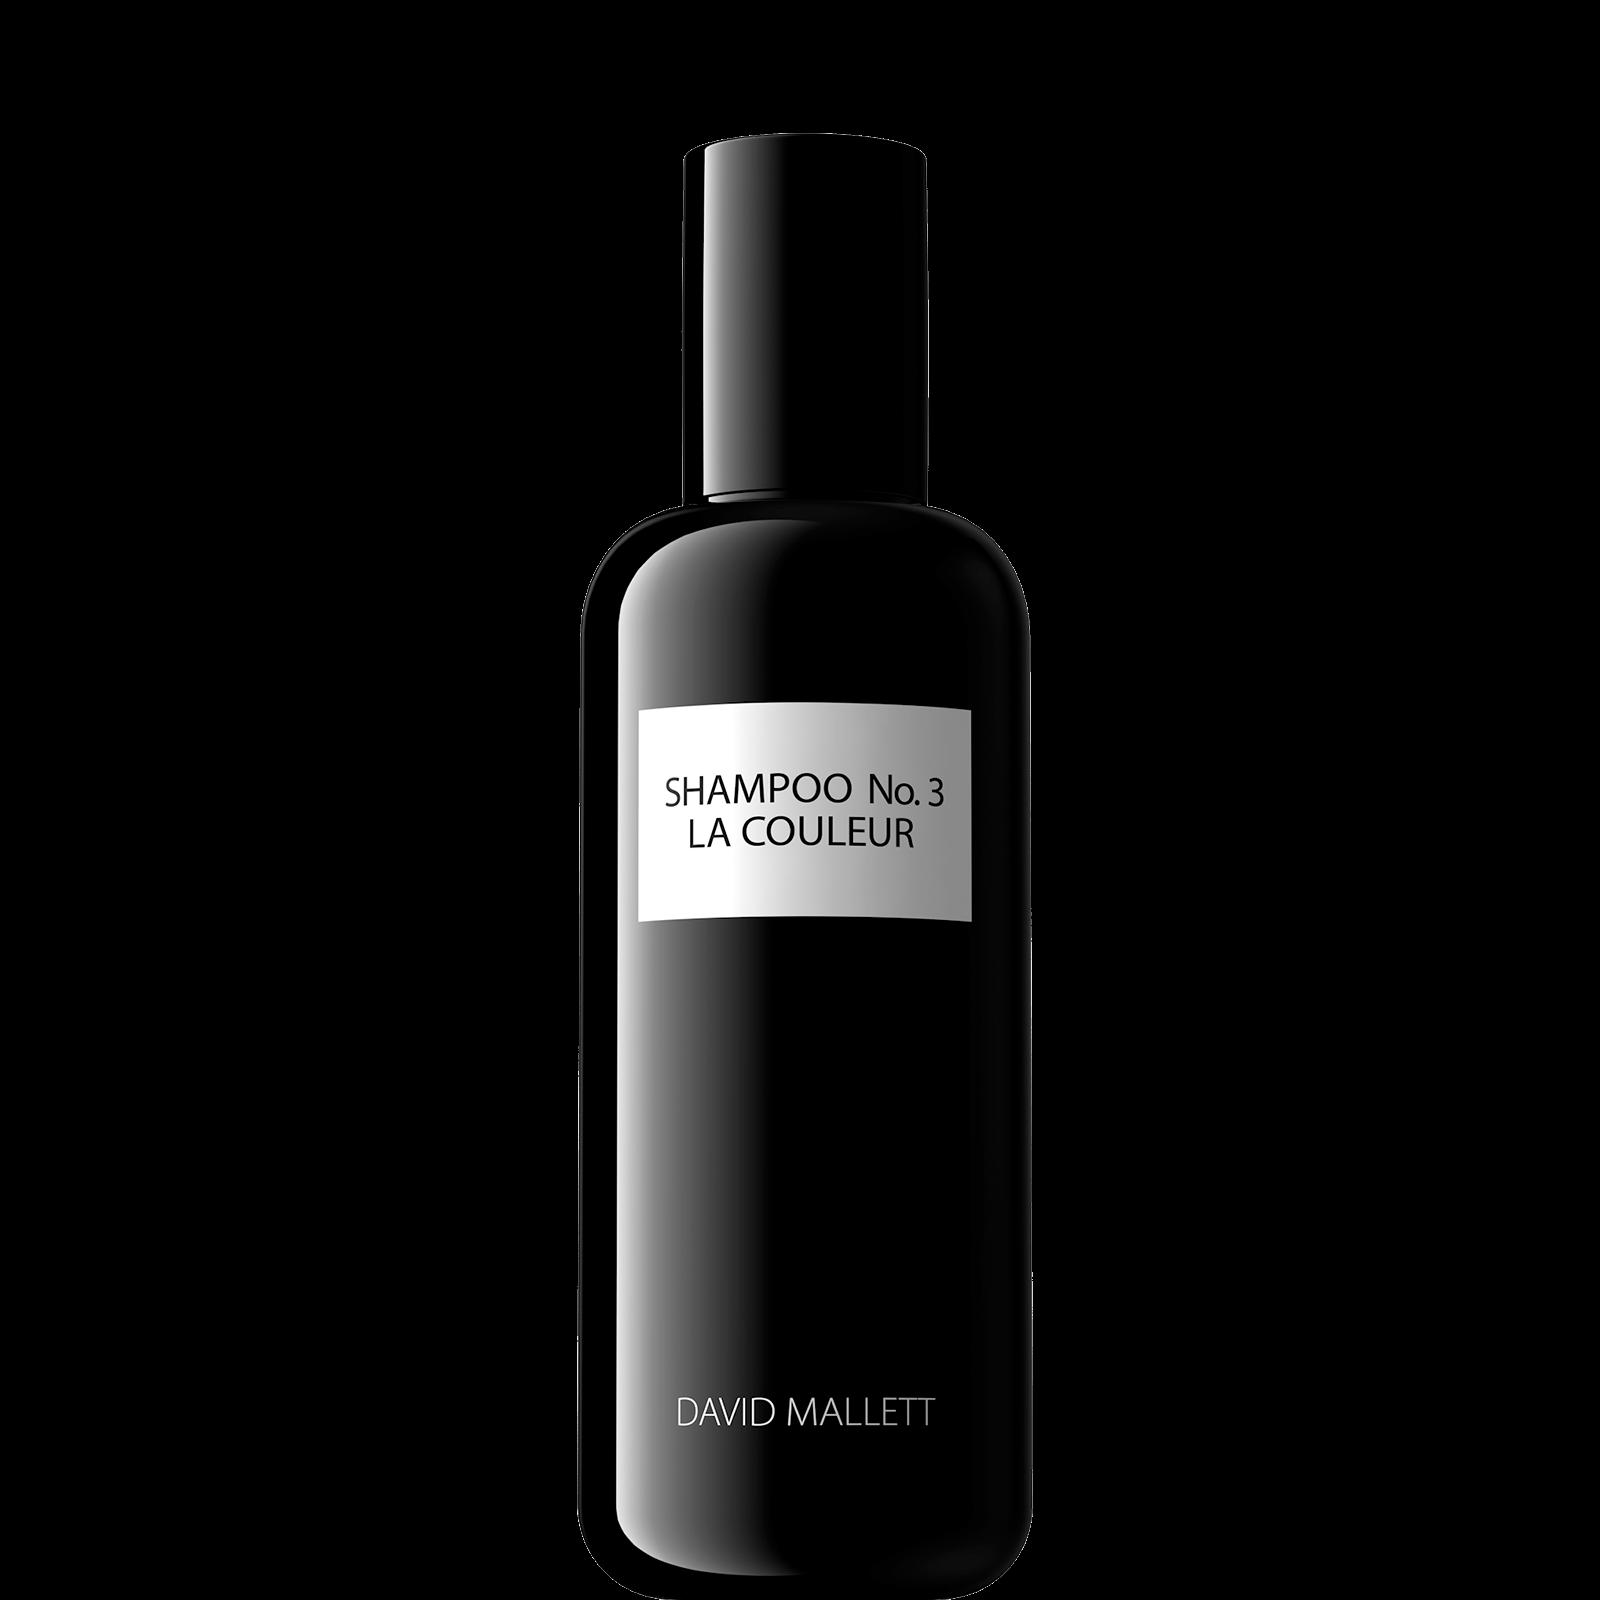 Shampoo No. 3